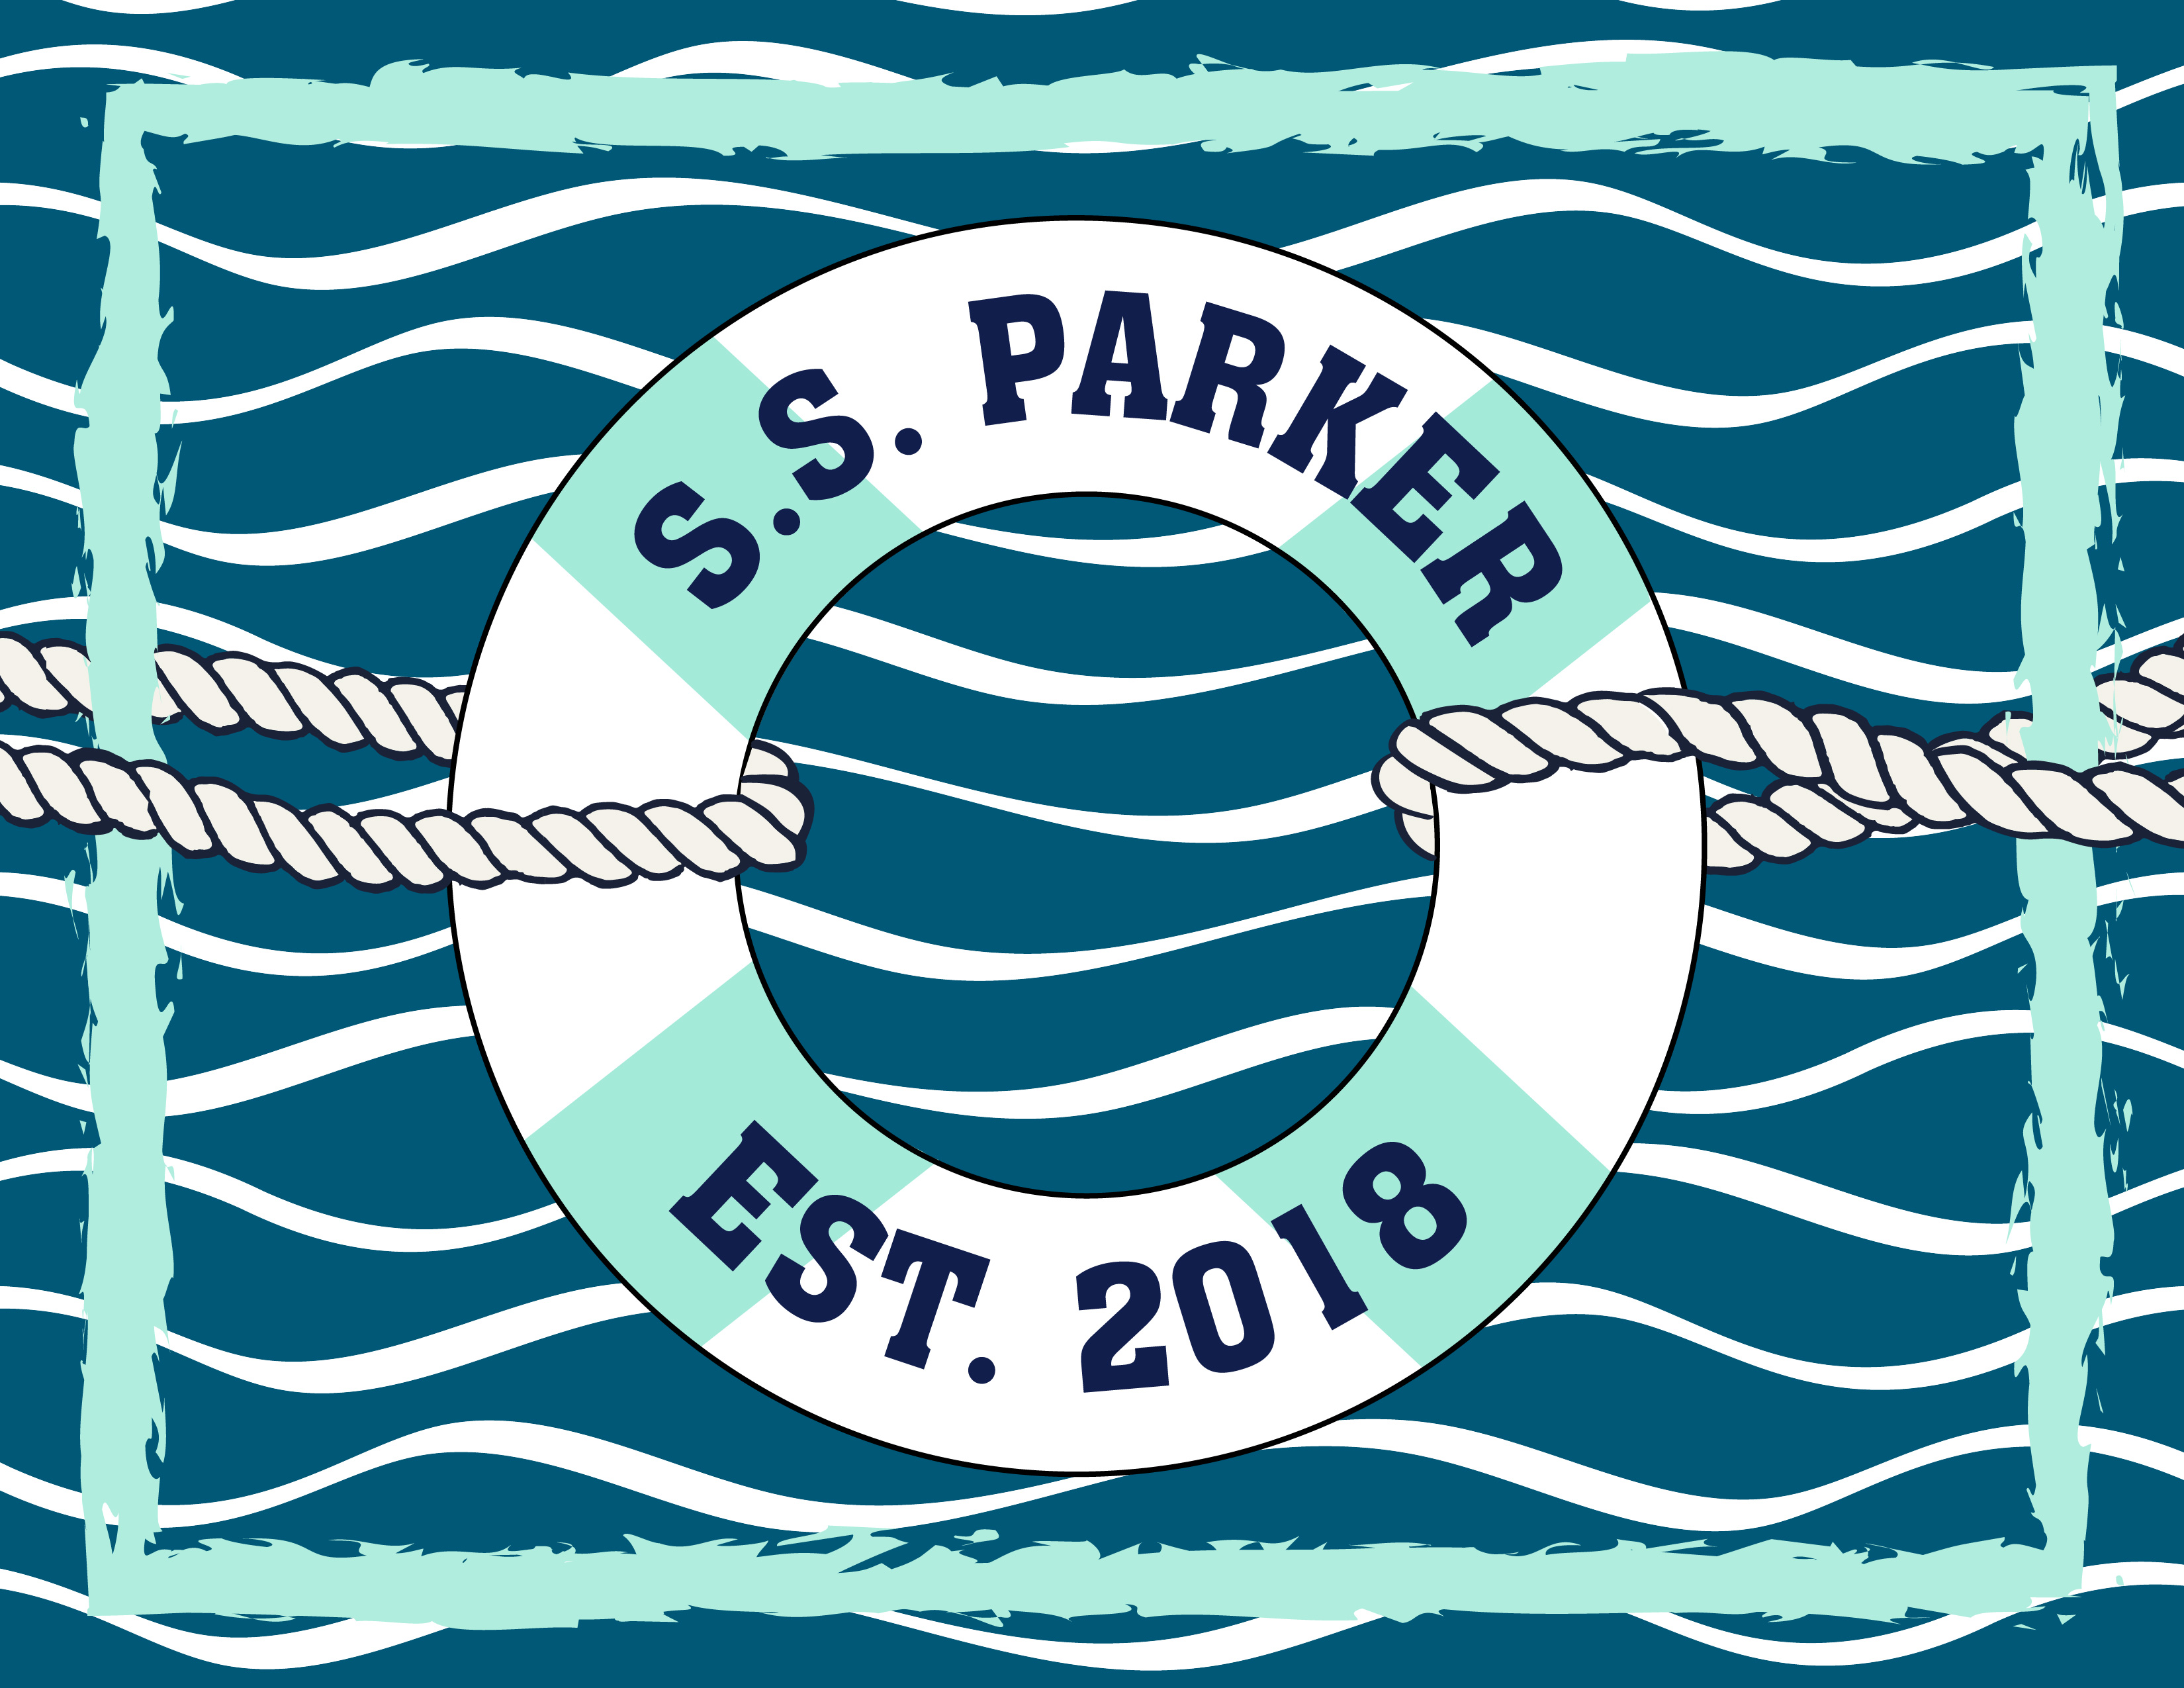 S.S. Parker - Diaper Ship Sign-01